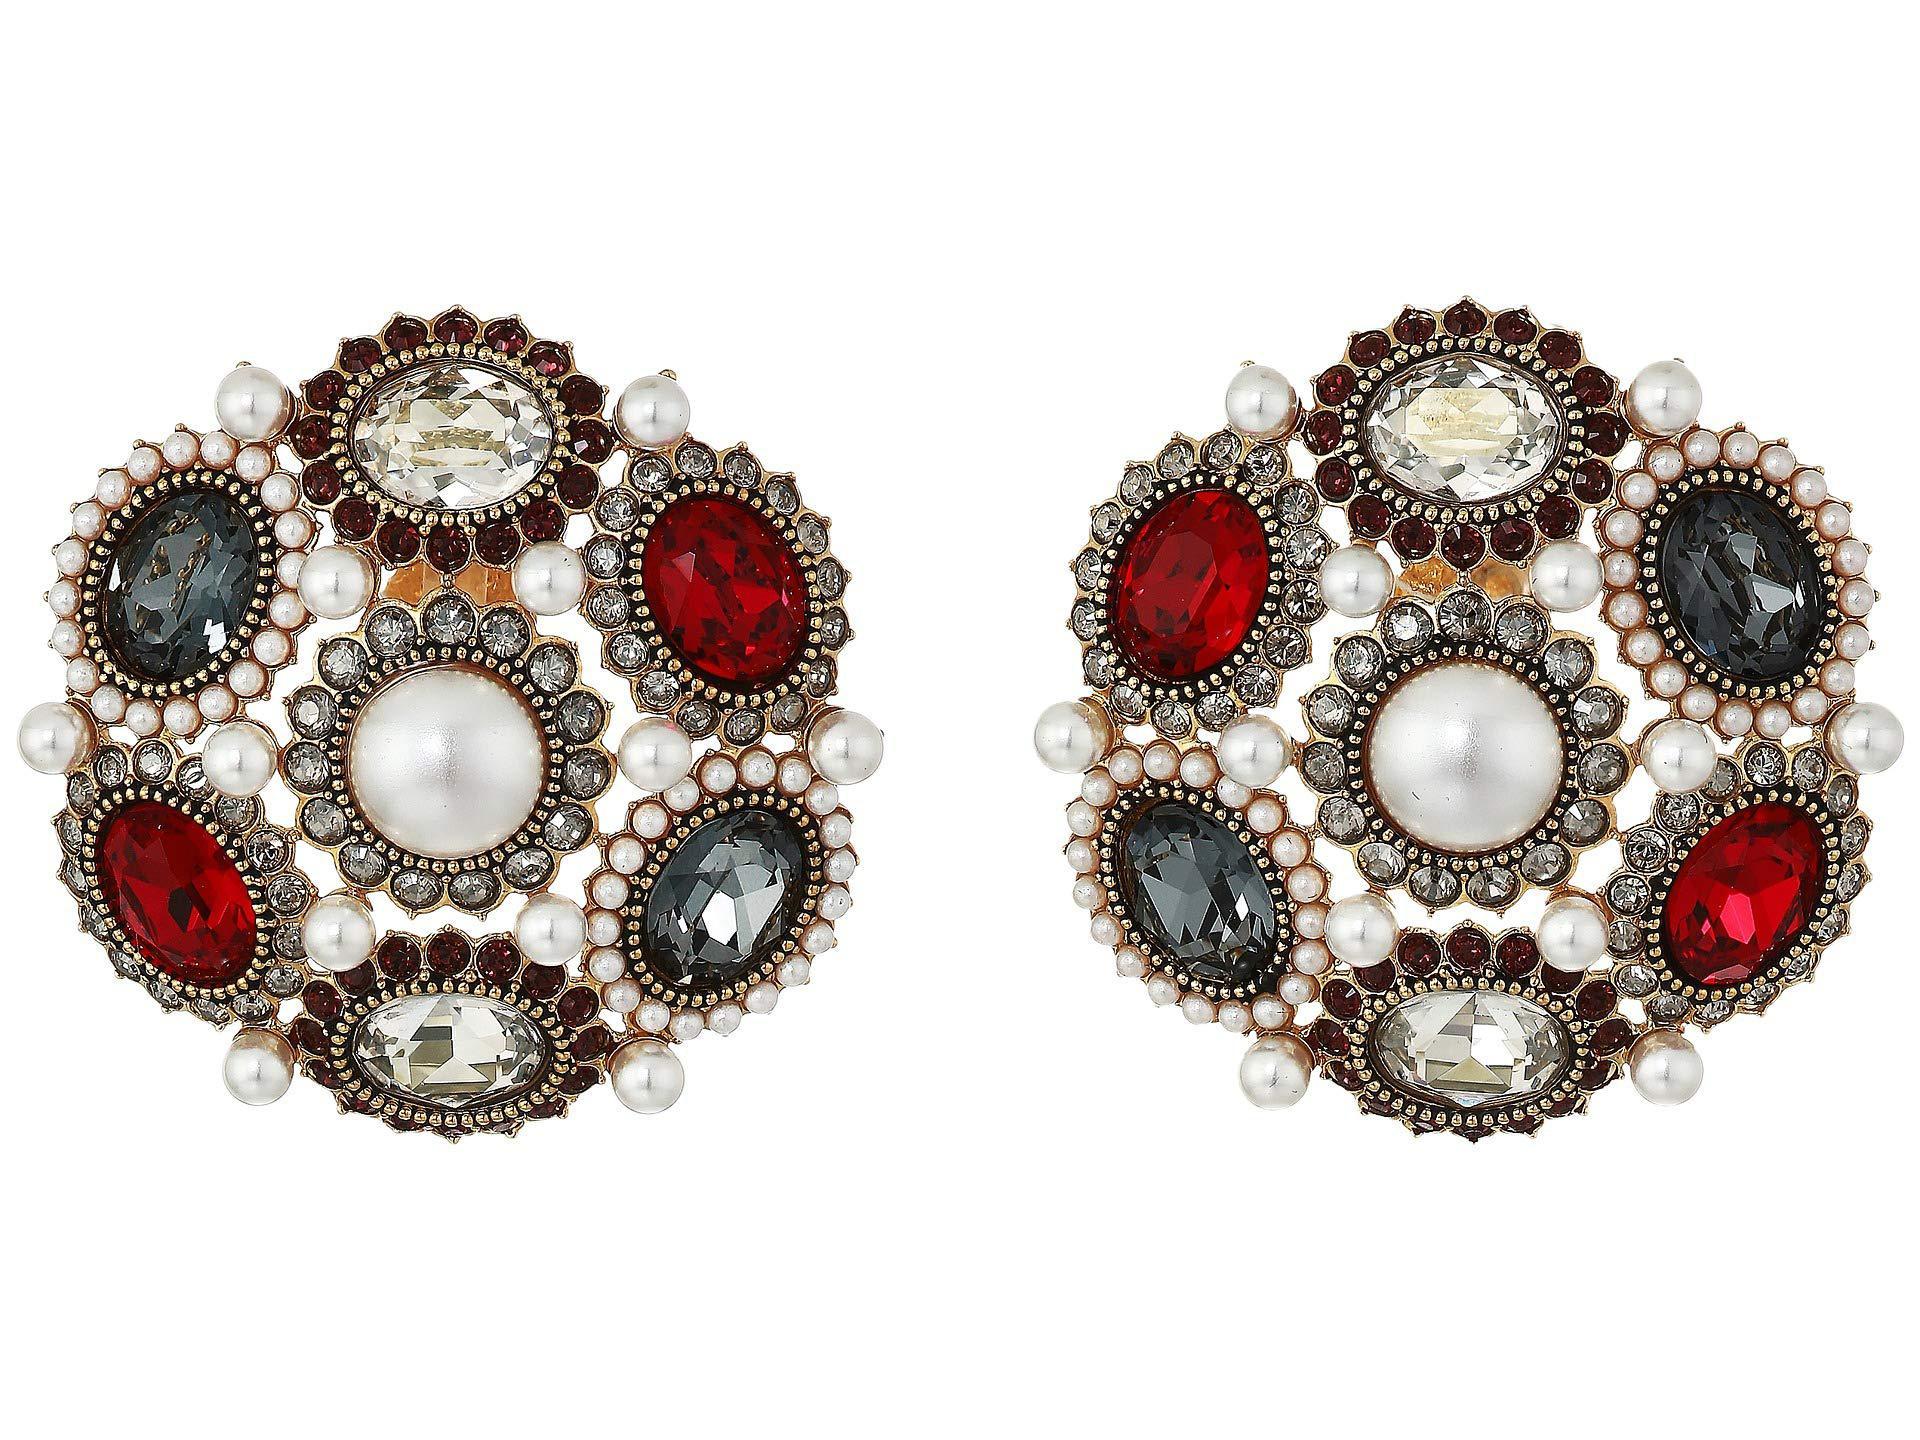 Millennium Clip Earrings Dark Multi Gold Plating Earring